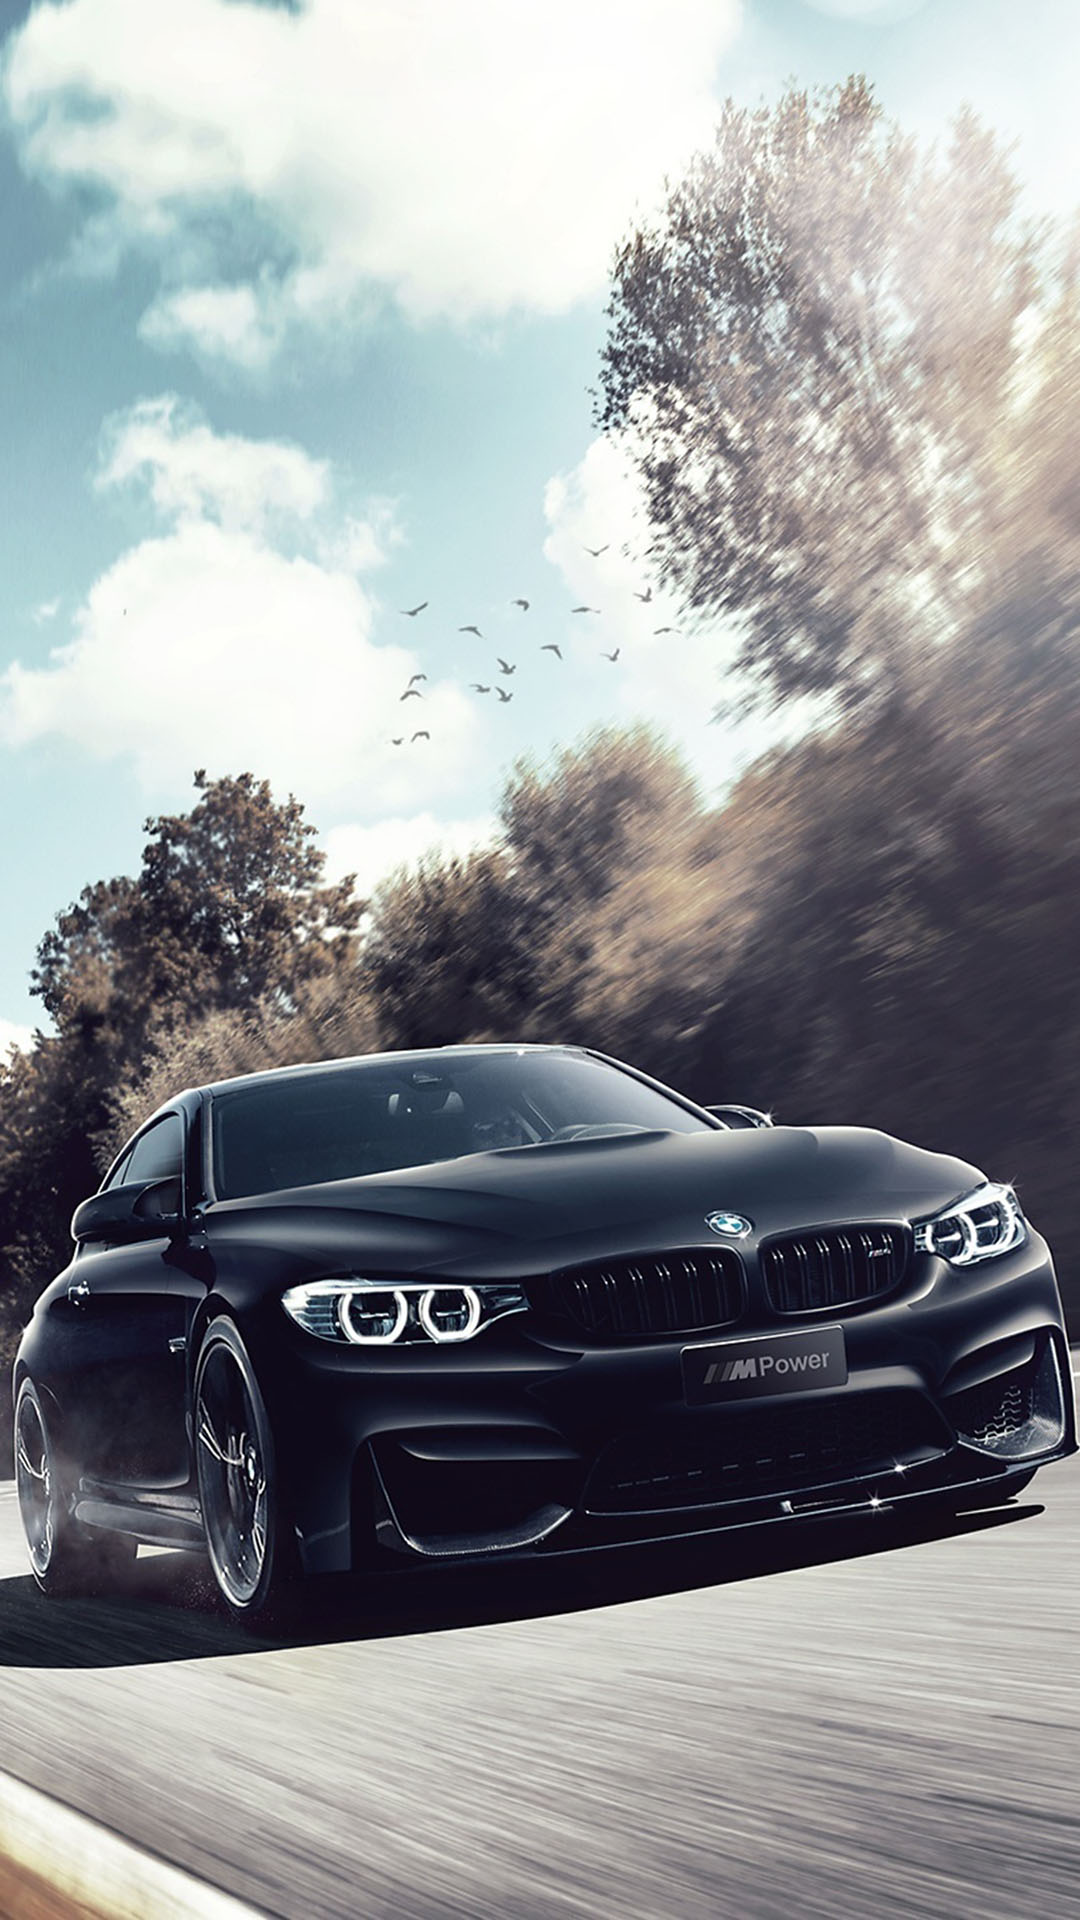 Bmw Luxury Cars Hd Wallpapers Bmw I8 2016 Wallpaper Hd Car